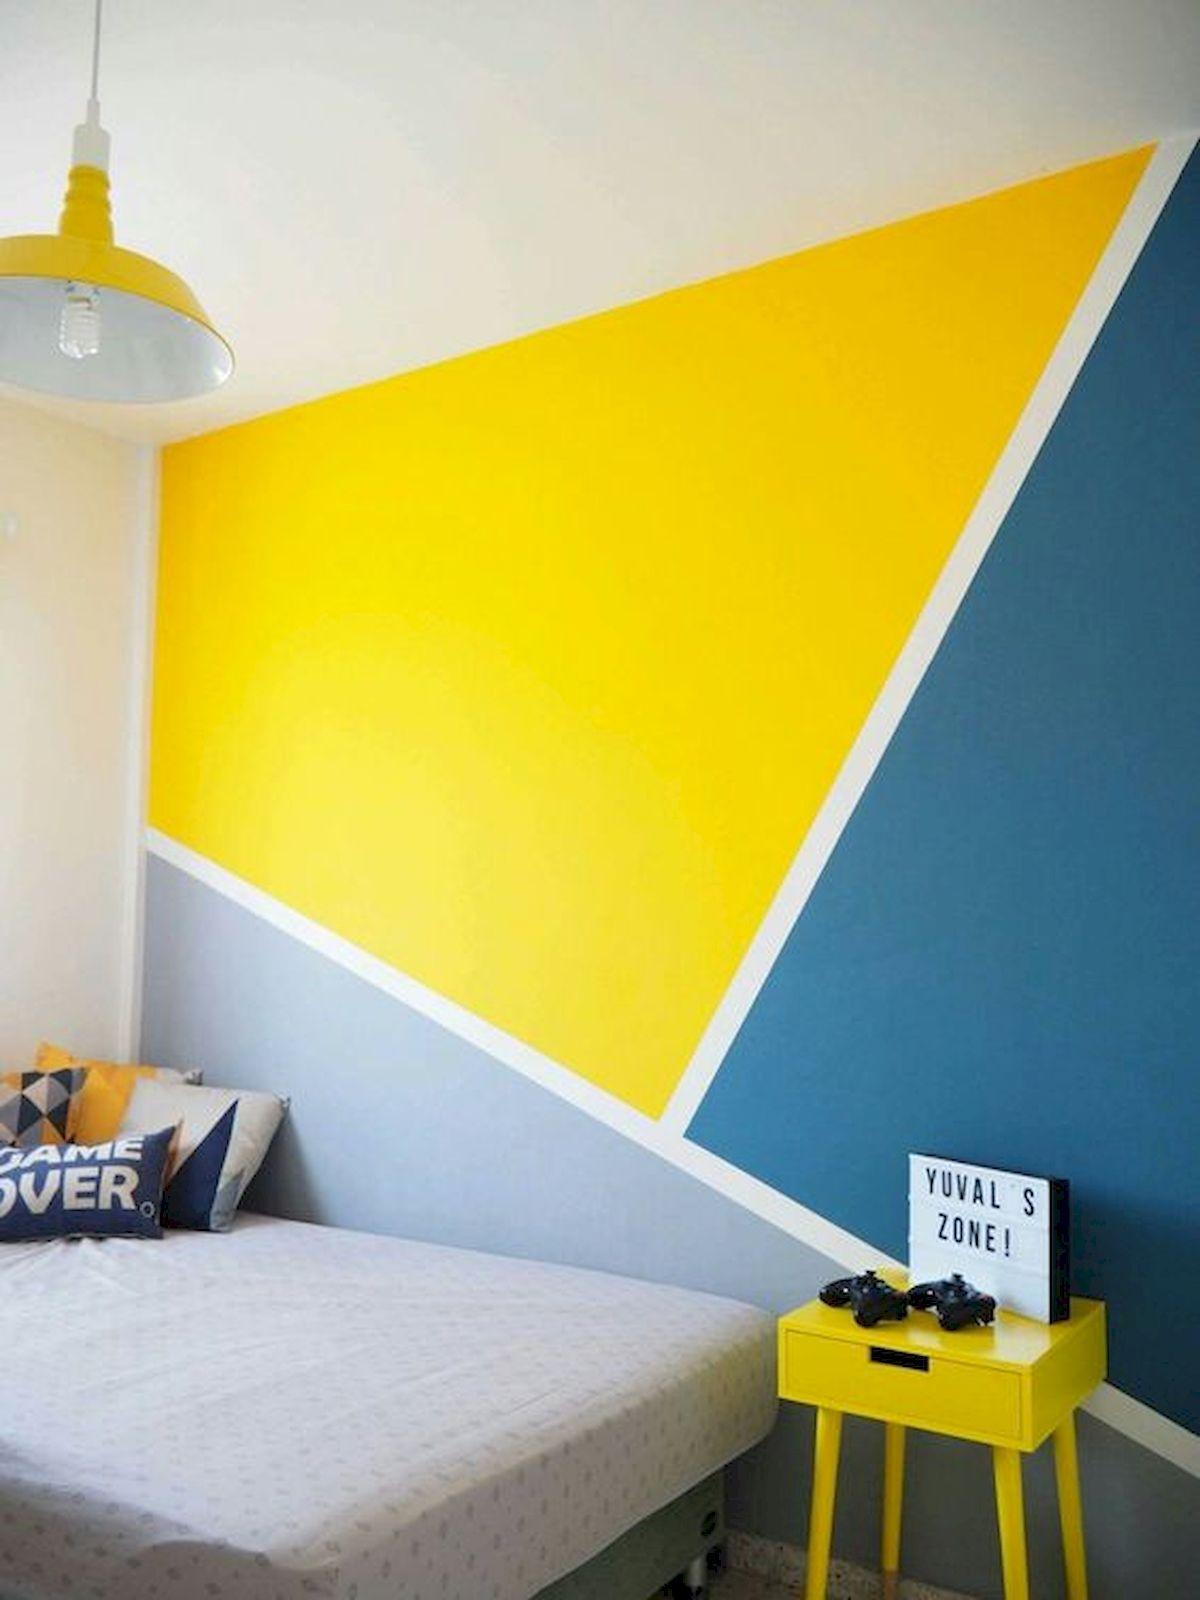 33 Best Geometric Wall Art Paint Design Ideas 33decor Bedroom Wall Paint Bedroom Wall Designs Diy Wall Painting